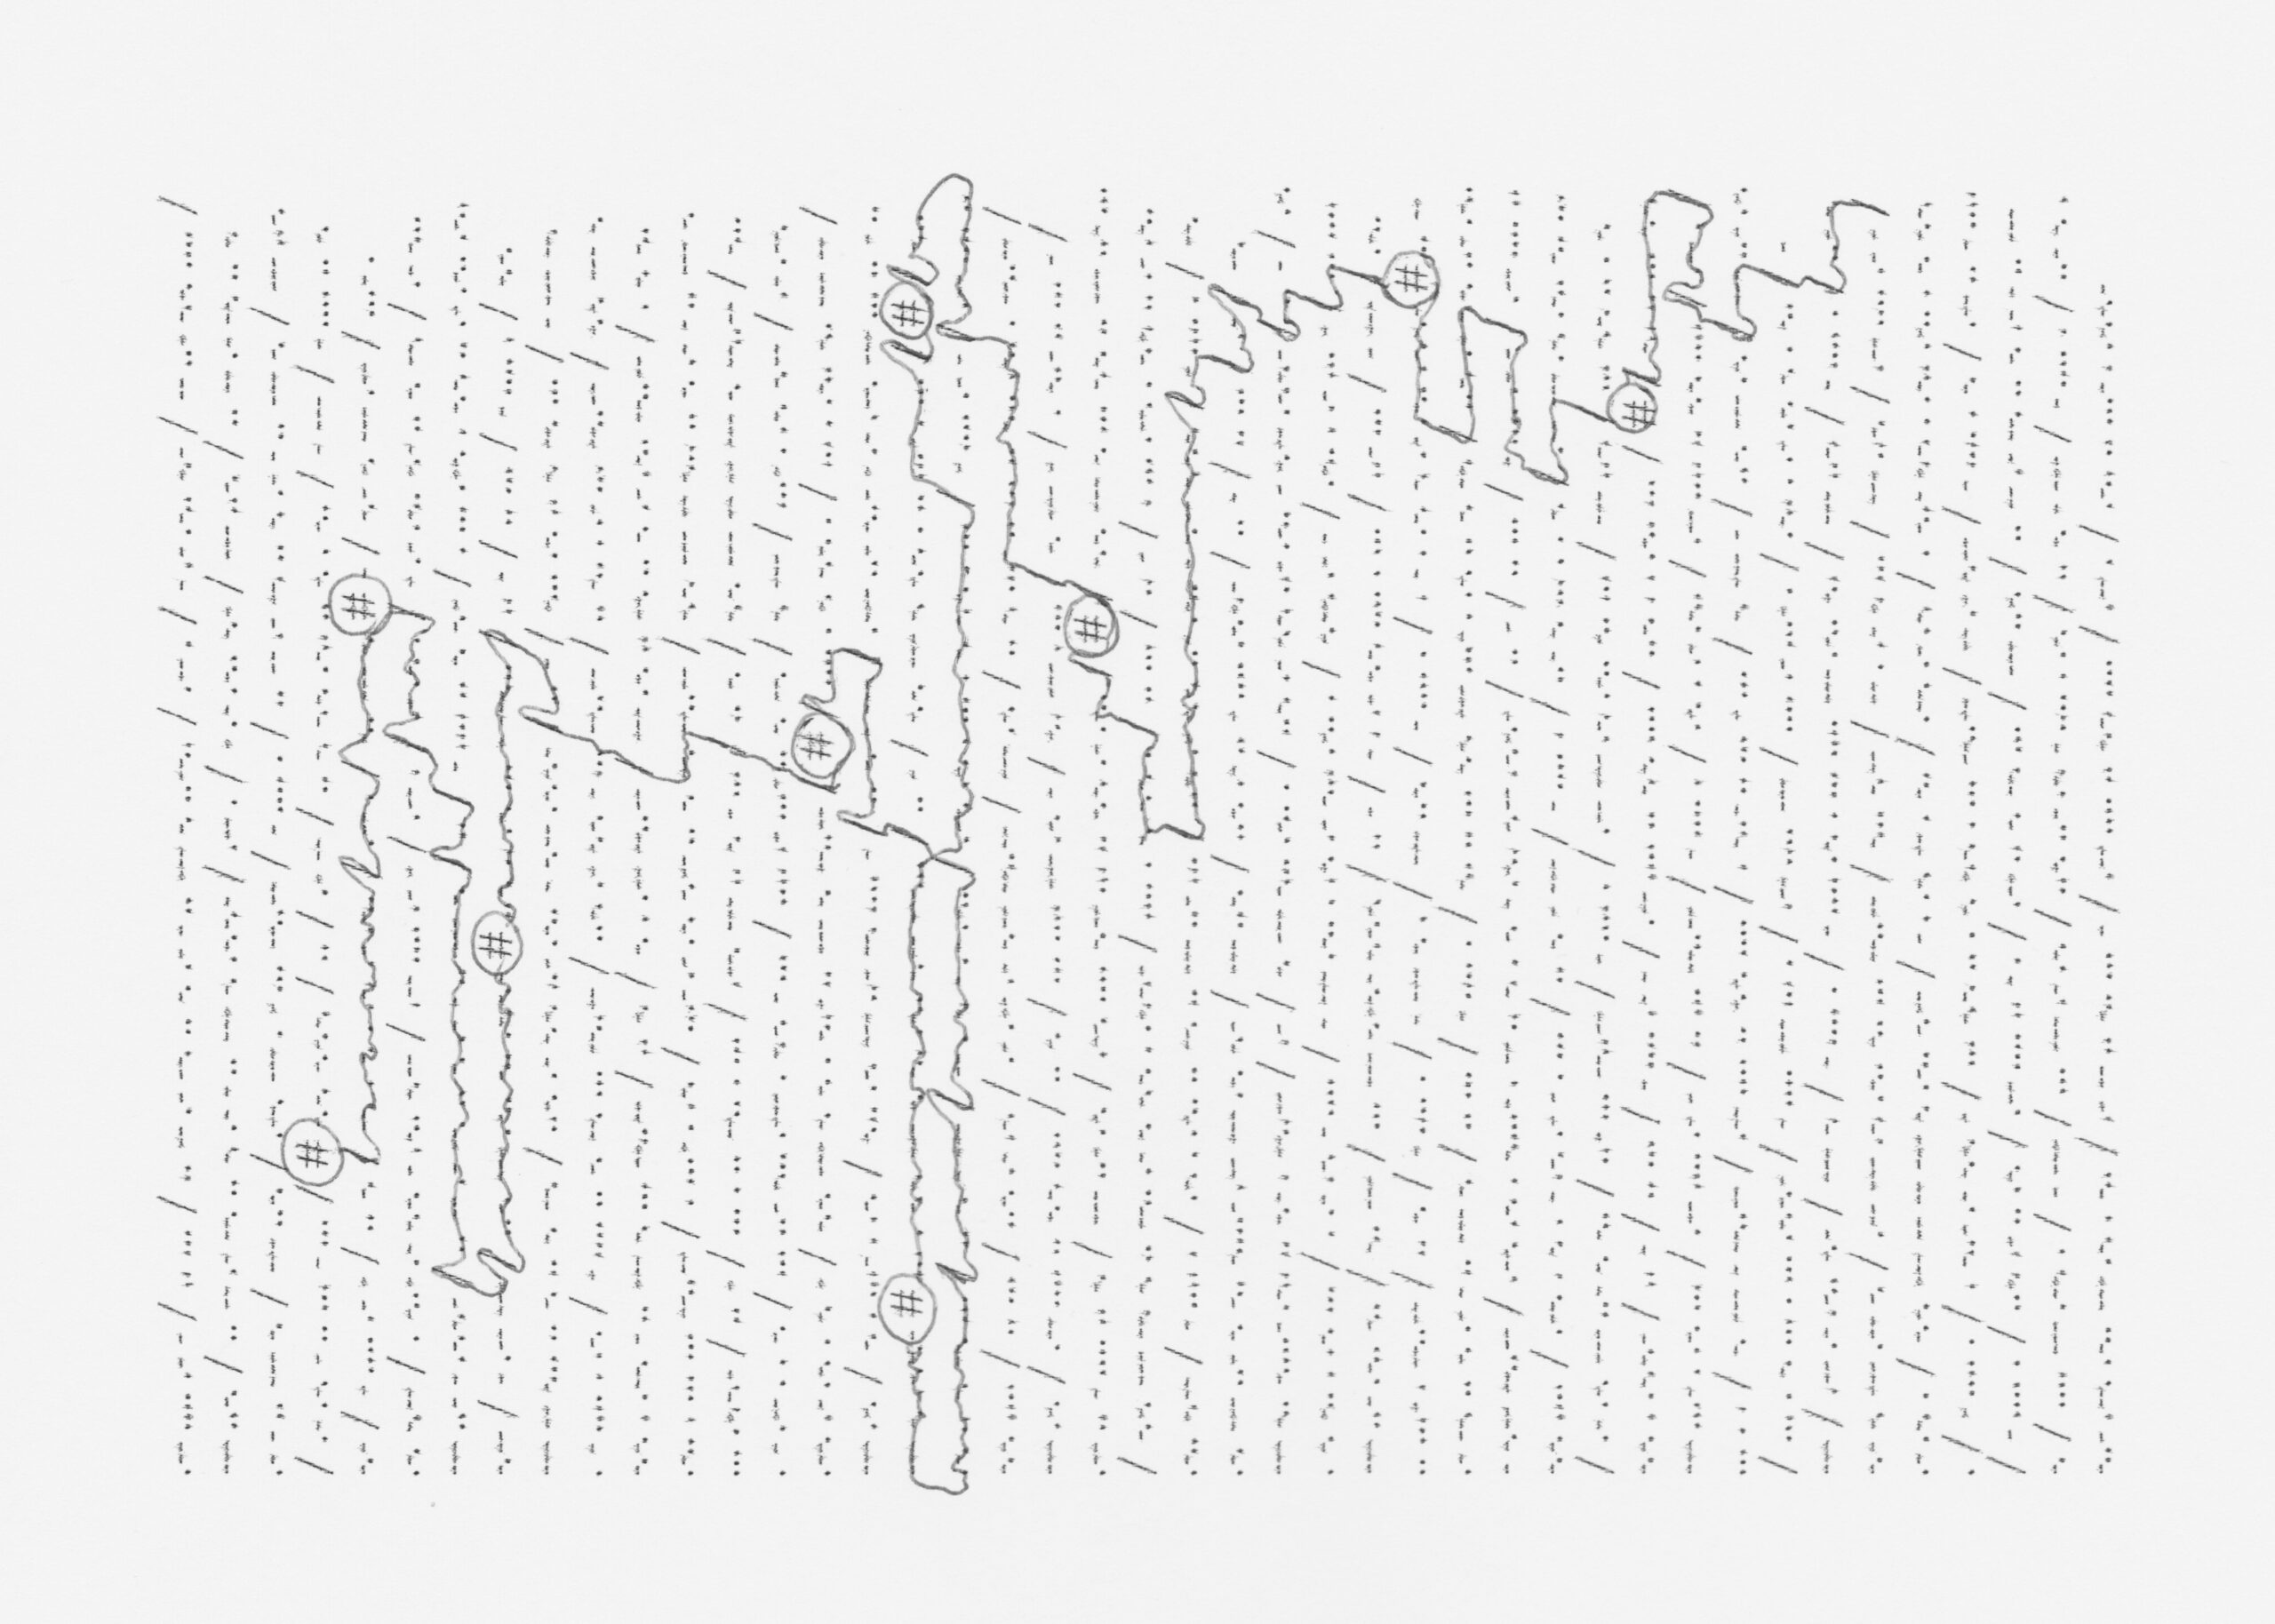 A_2020_04_23_scans_total_morseknittingScan-6